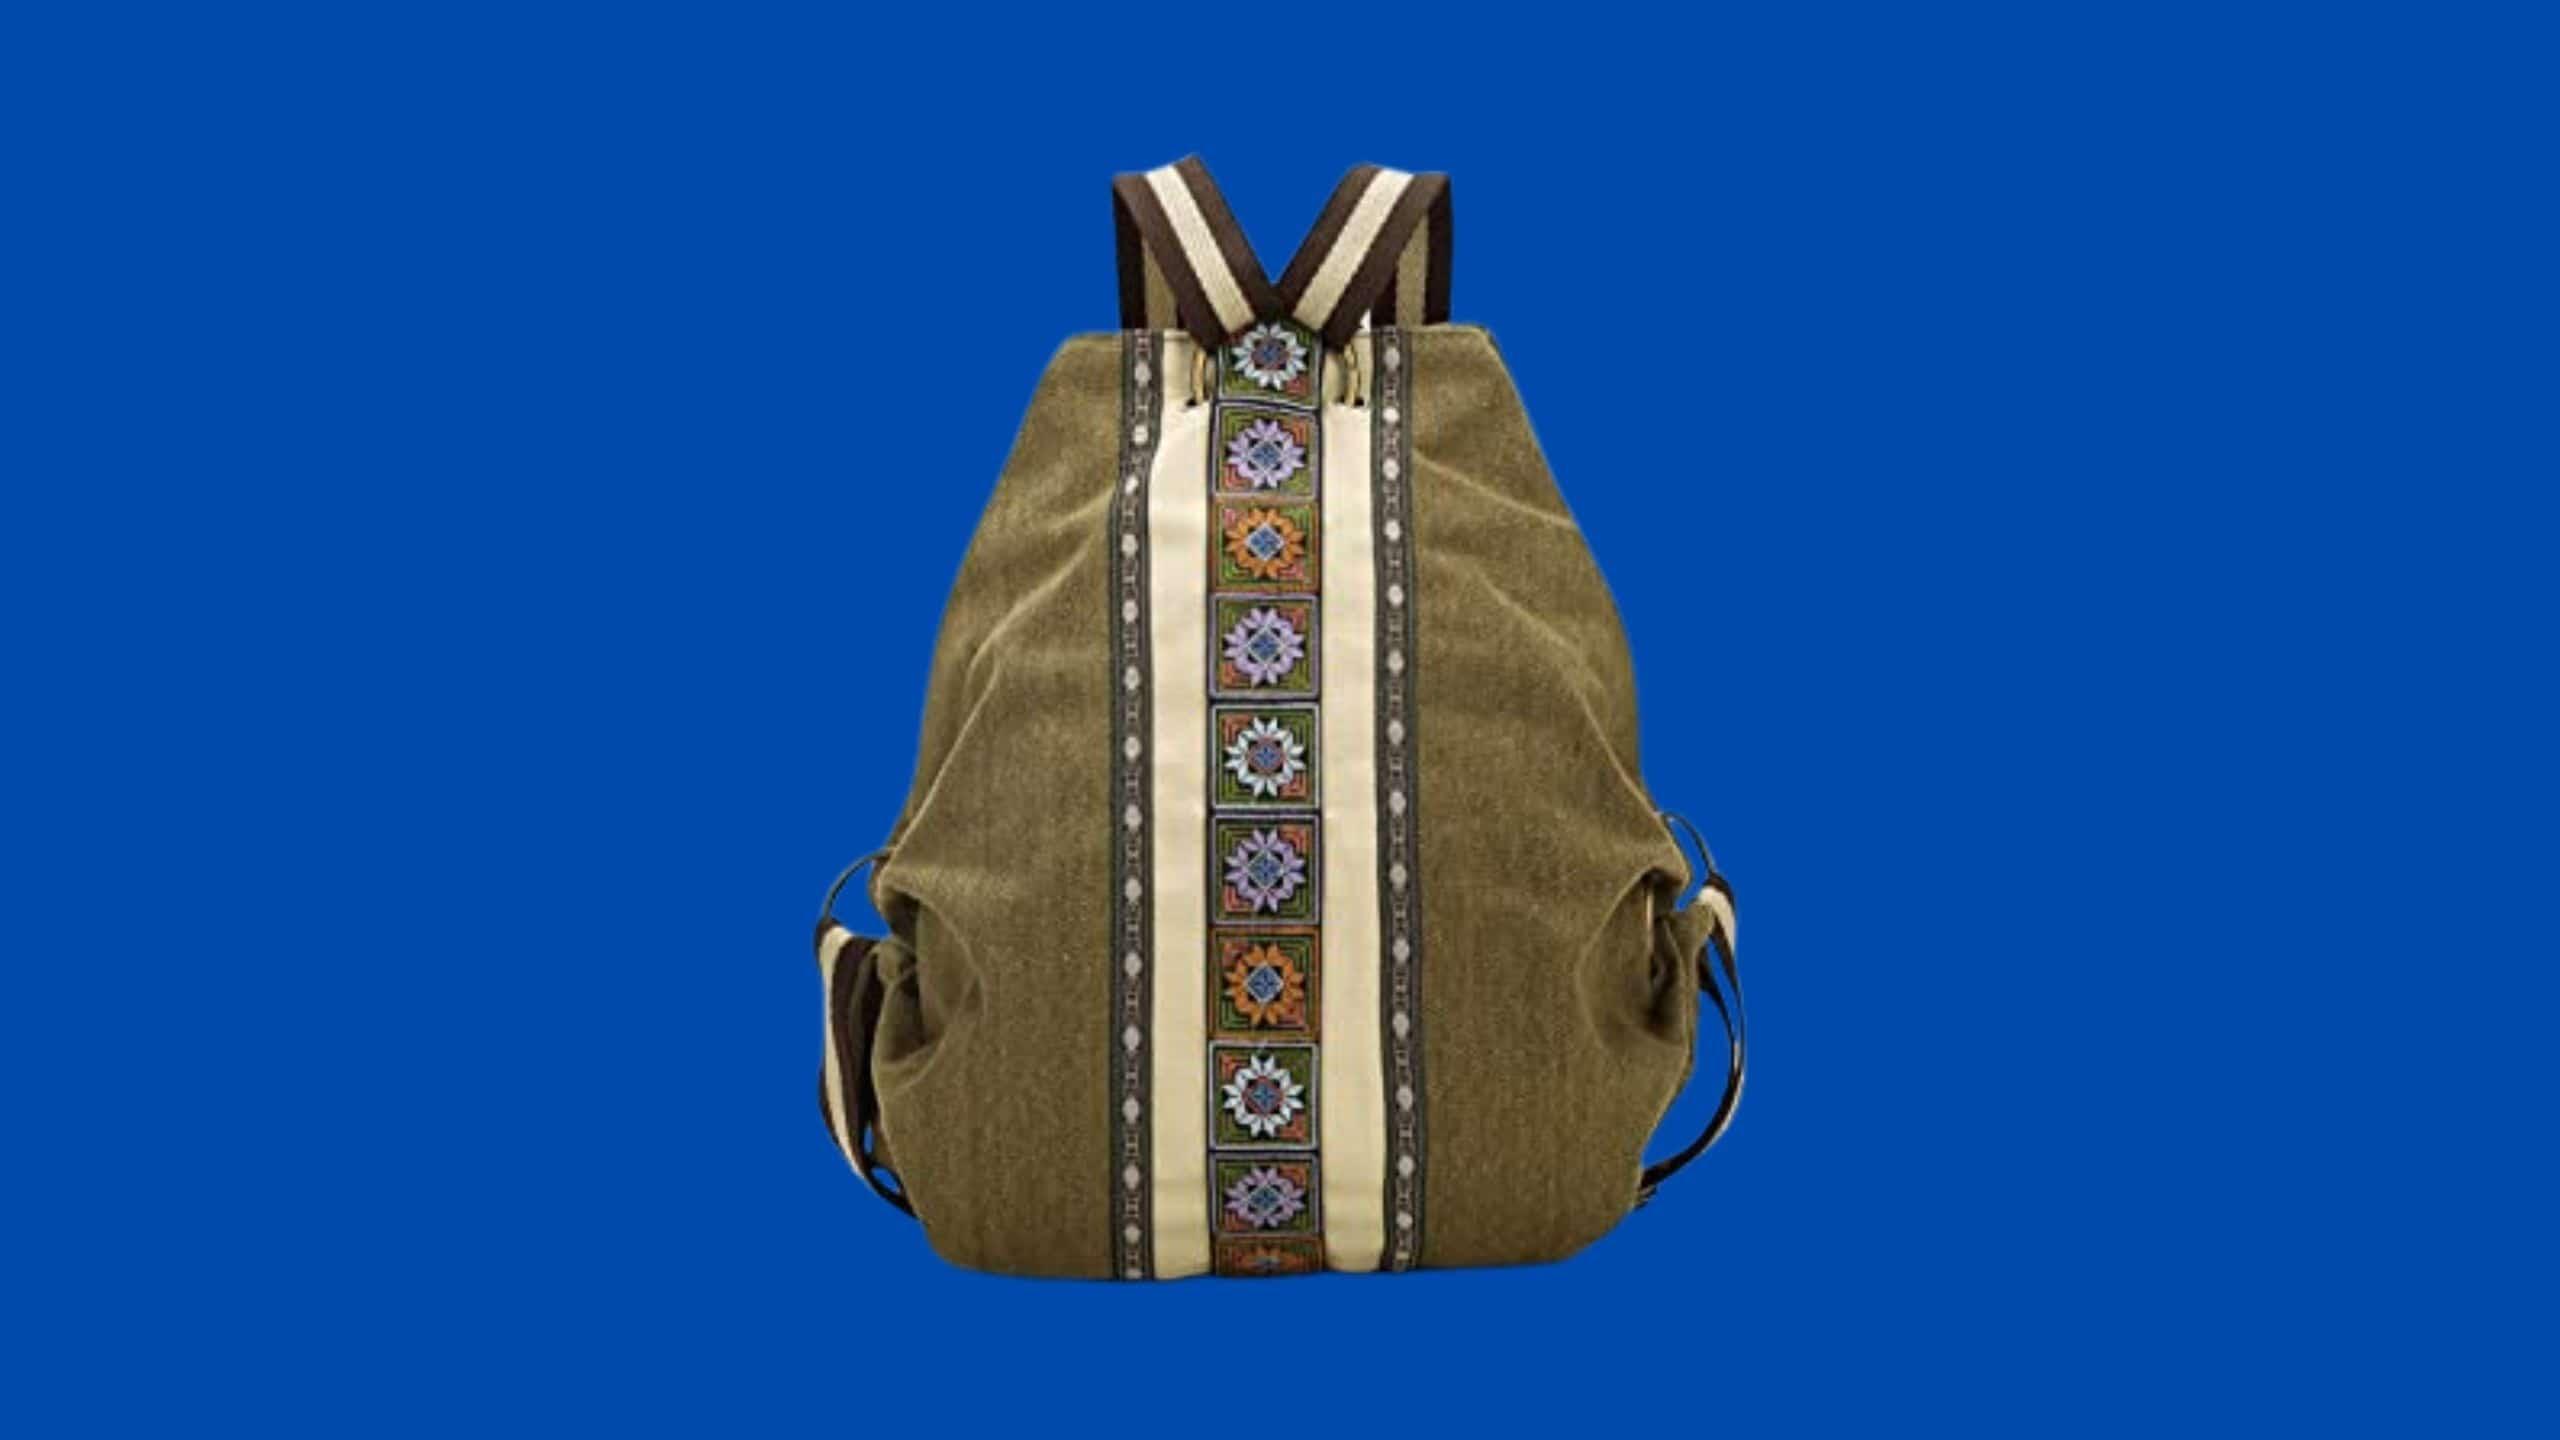 https://www.amazon.com/Backpack-Daypack-Shoulder-Heavy-duty-Anti-theft/dp/B07BKQWGDM?dchild=1&keywords=backpack+for+travel+festival&qid=1628235391&refinements=p_72%3A2661618011&rnid=2661617011&sr=8-1&linkCode=ll1&tag=deepinthemix-20&linkId=ba0466cc438326ee32a4e11c29ba32cc&language=en_US&ref_=as_li_ss_tl